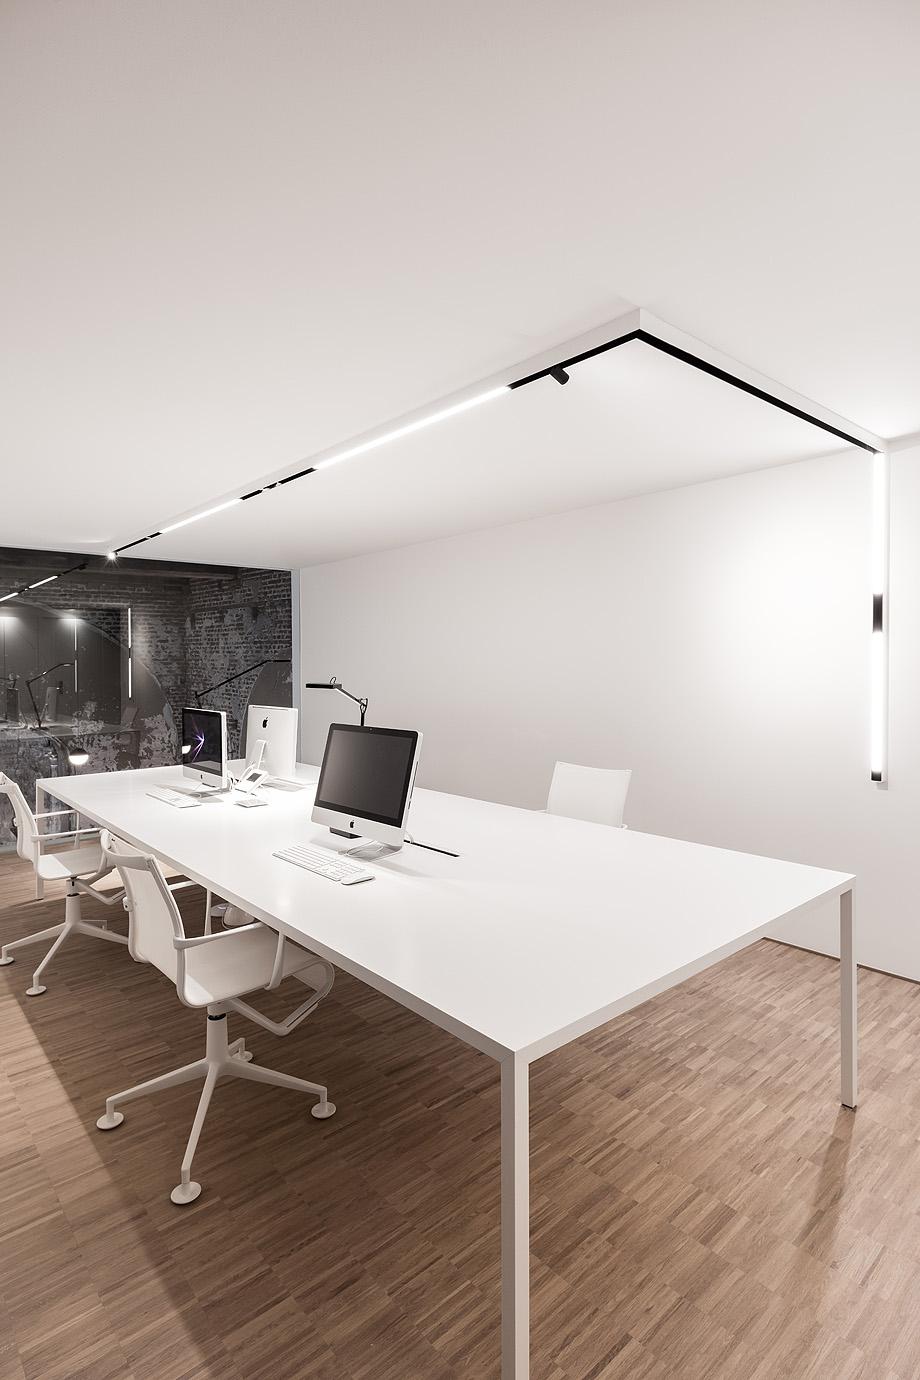 oficina de arquitectura de klaarchitectuur - foto valerie clarysse (9)